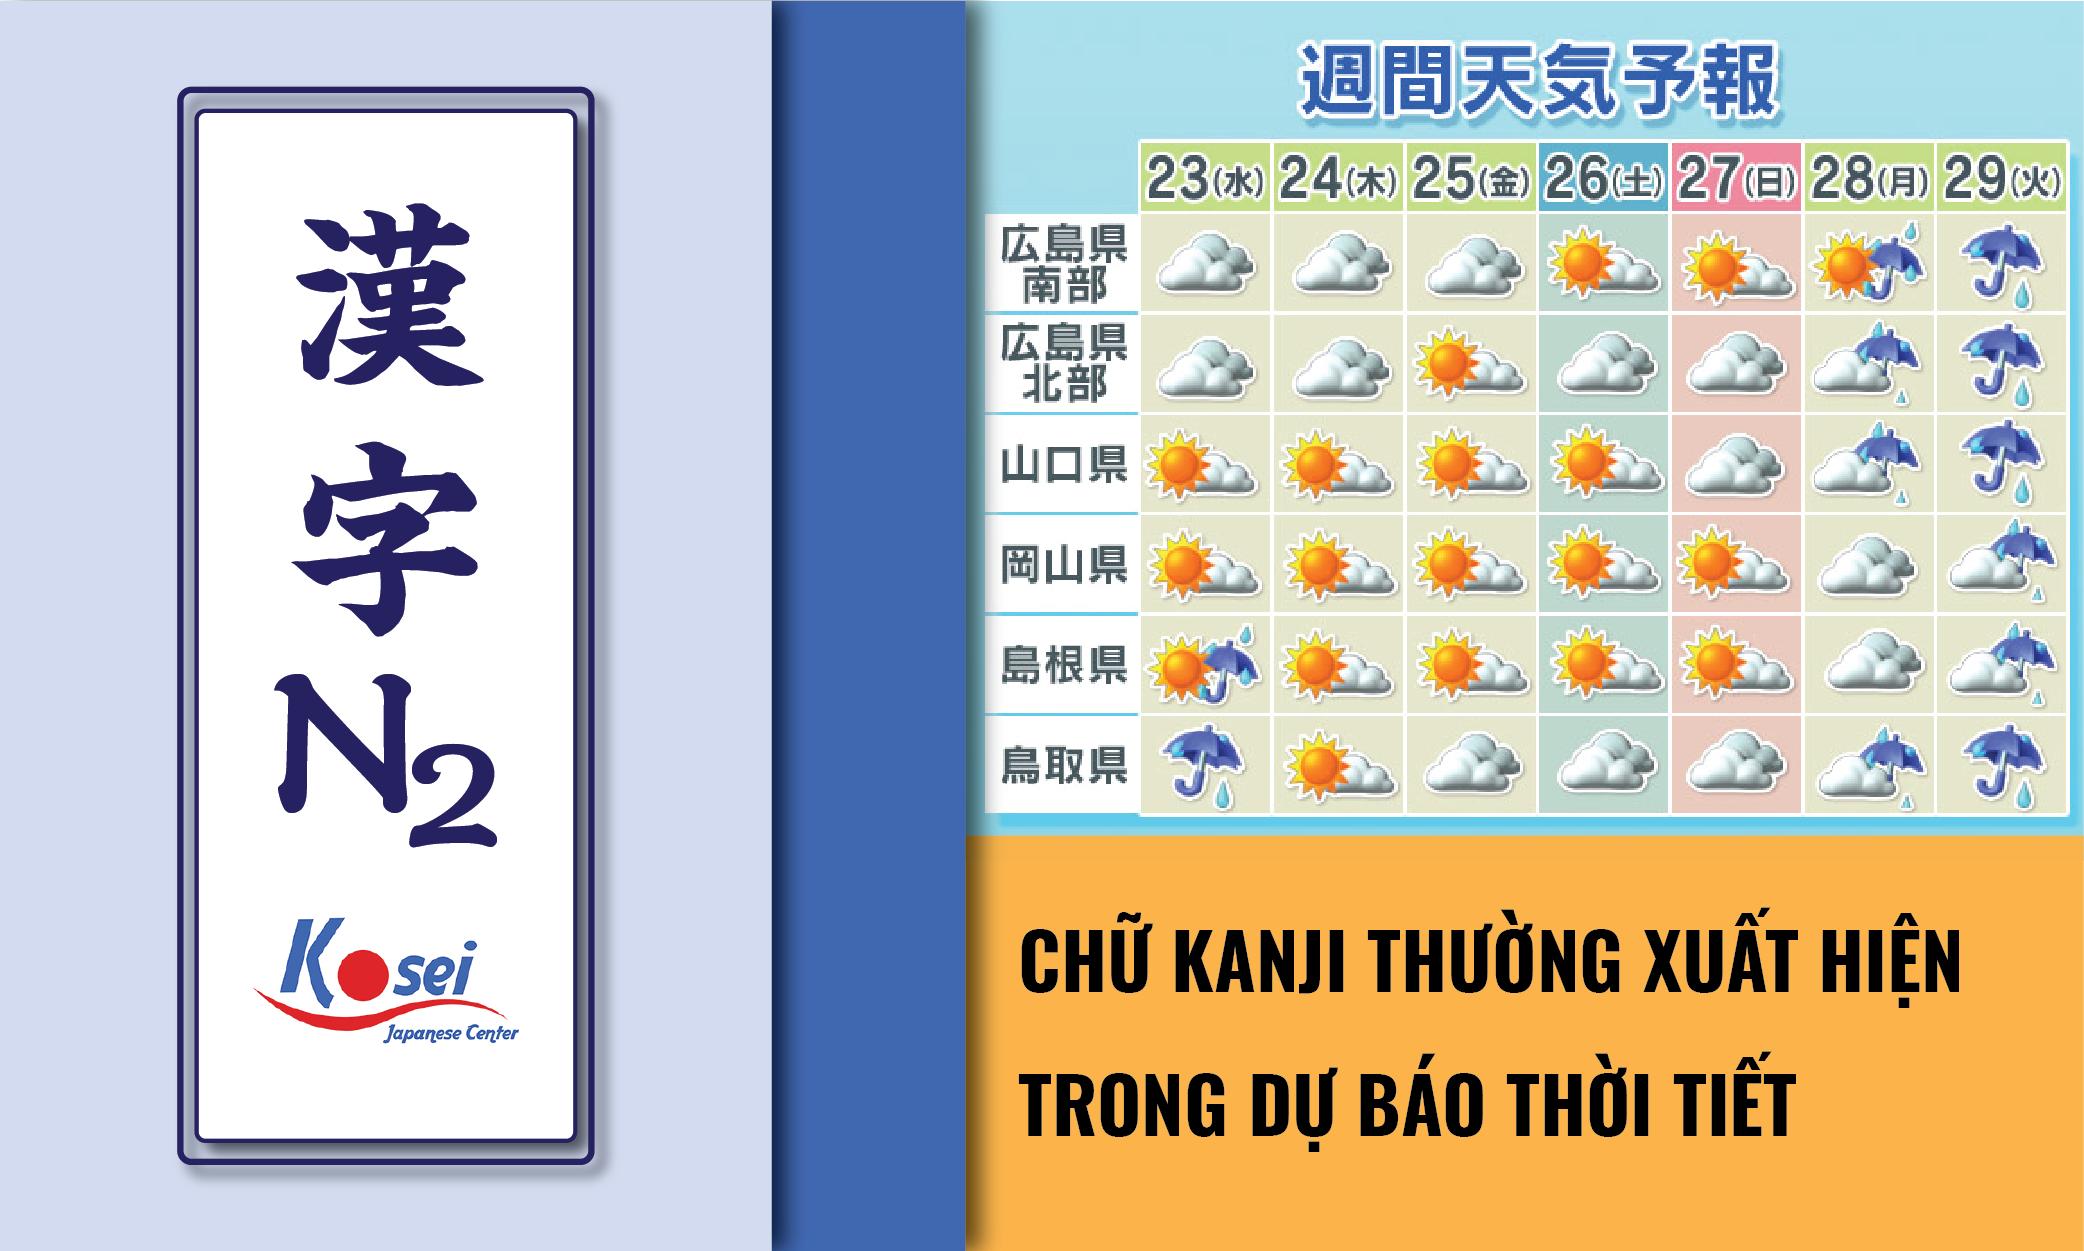 https://kosei.vn/tong-hop-kanji-n2-cac-kanji-ve-ban-tin-thoi-tiet-n2256.html